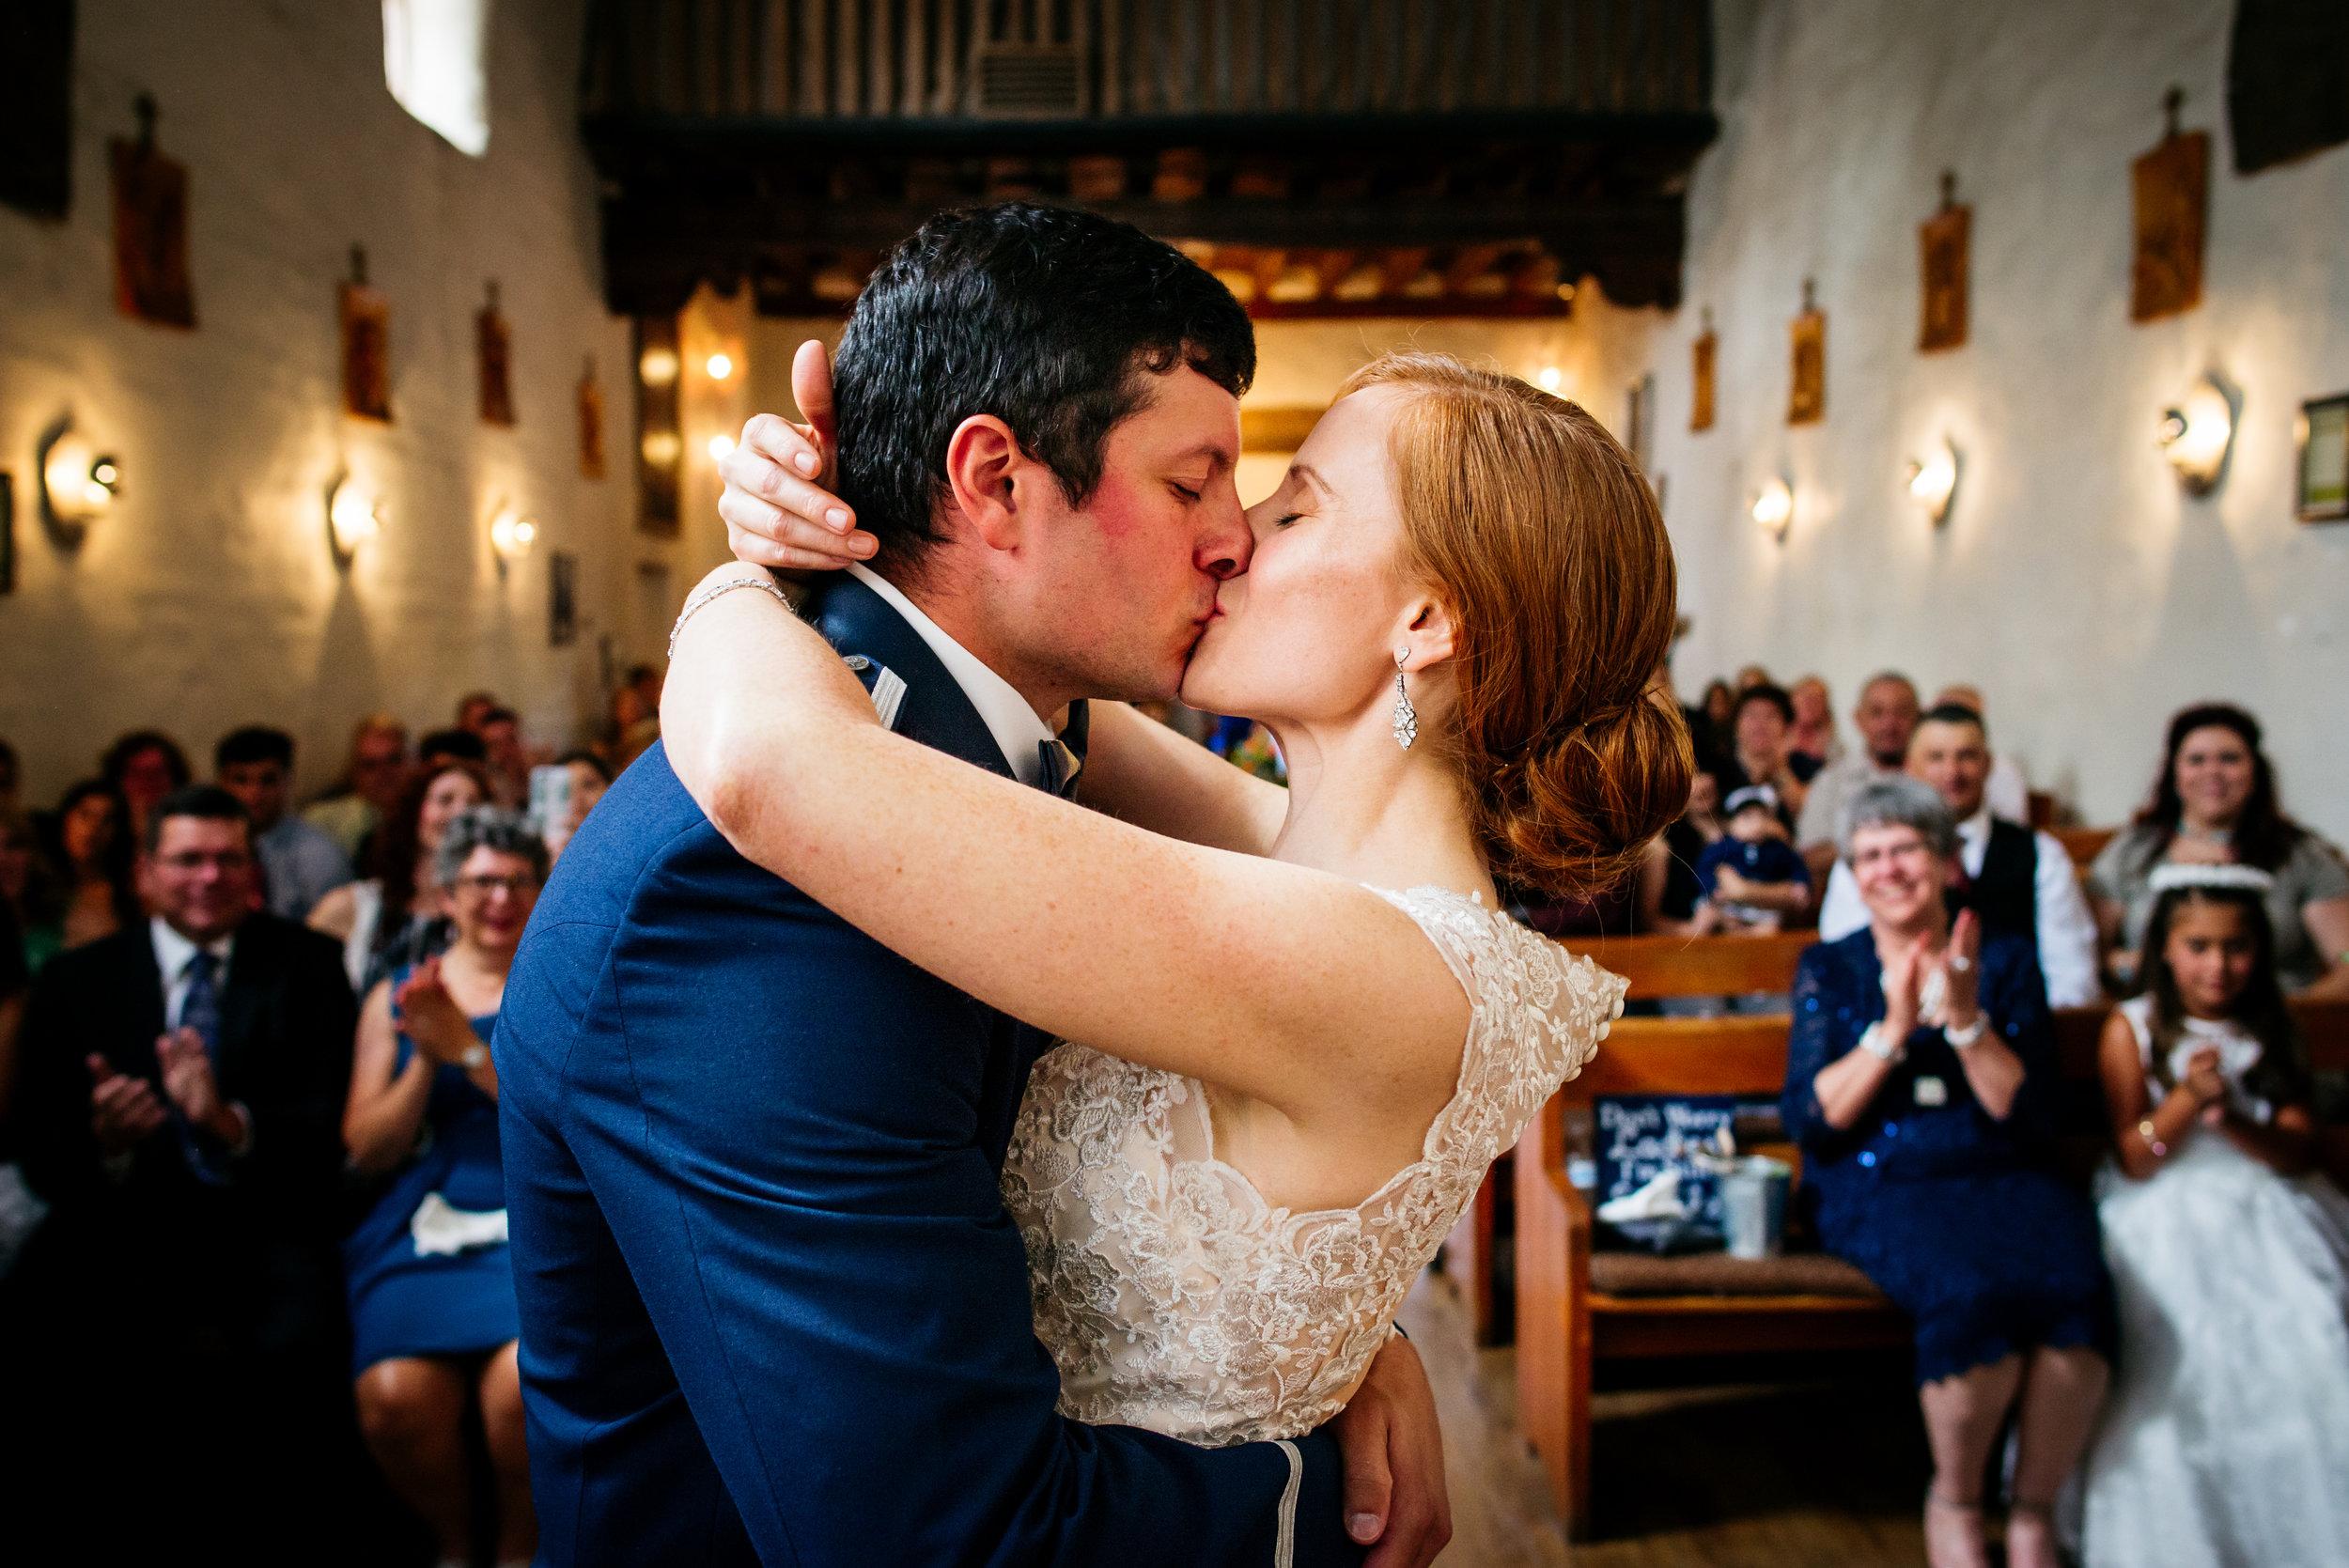 Santa Fe Railyards Wedding Extended Play Photography-11.jpg